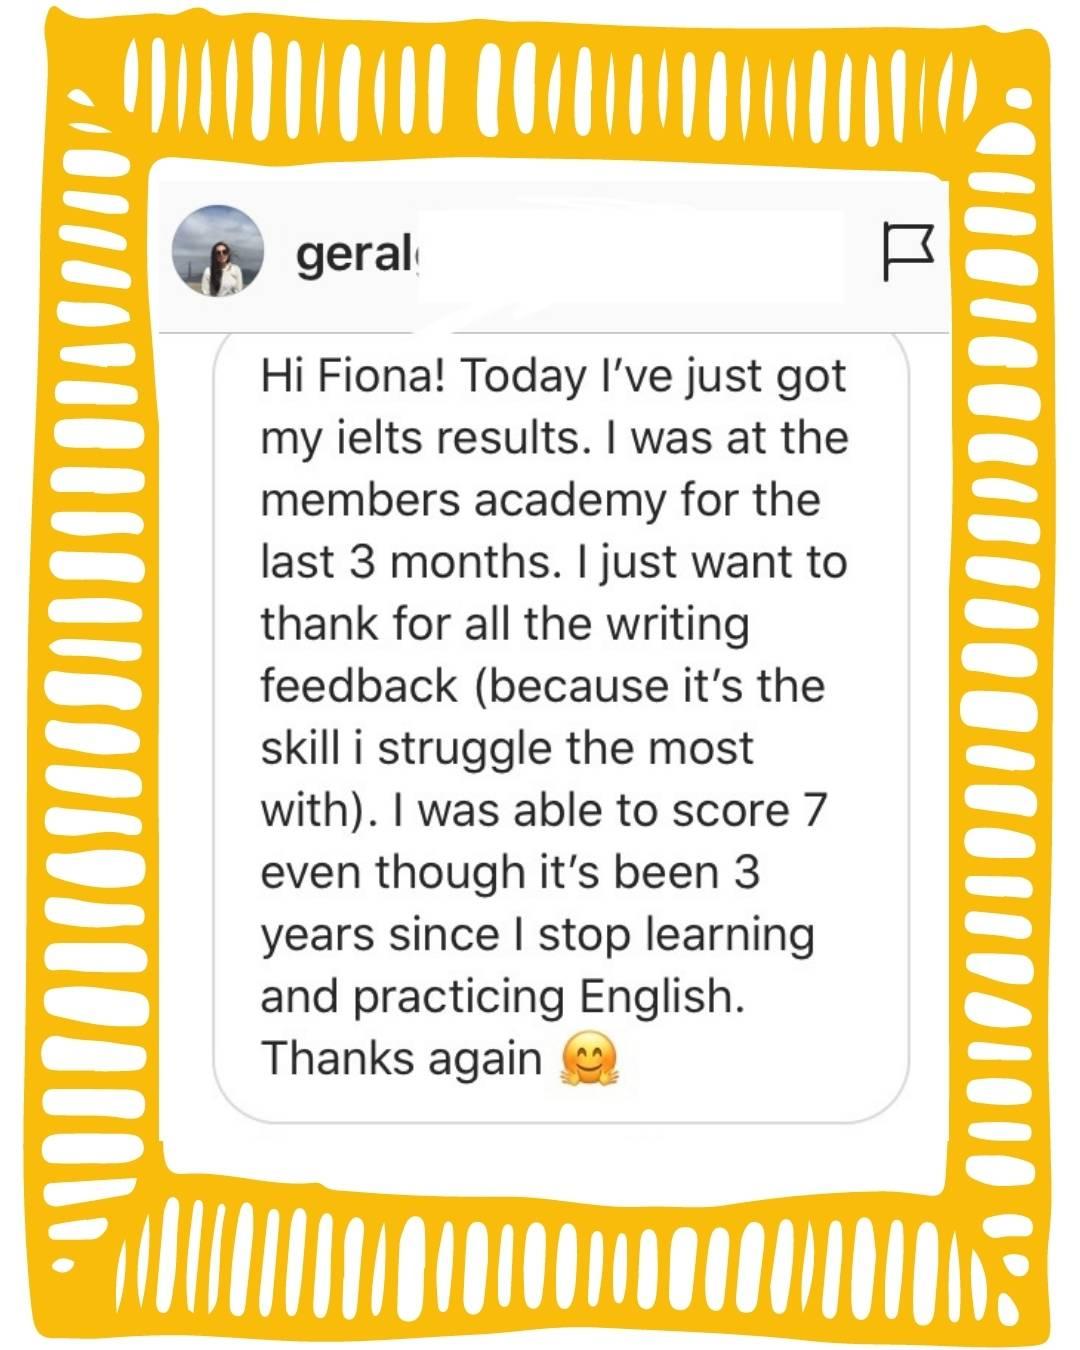 IELTS Members Academy Review Gabriel